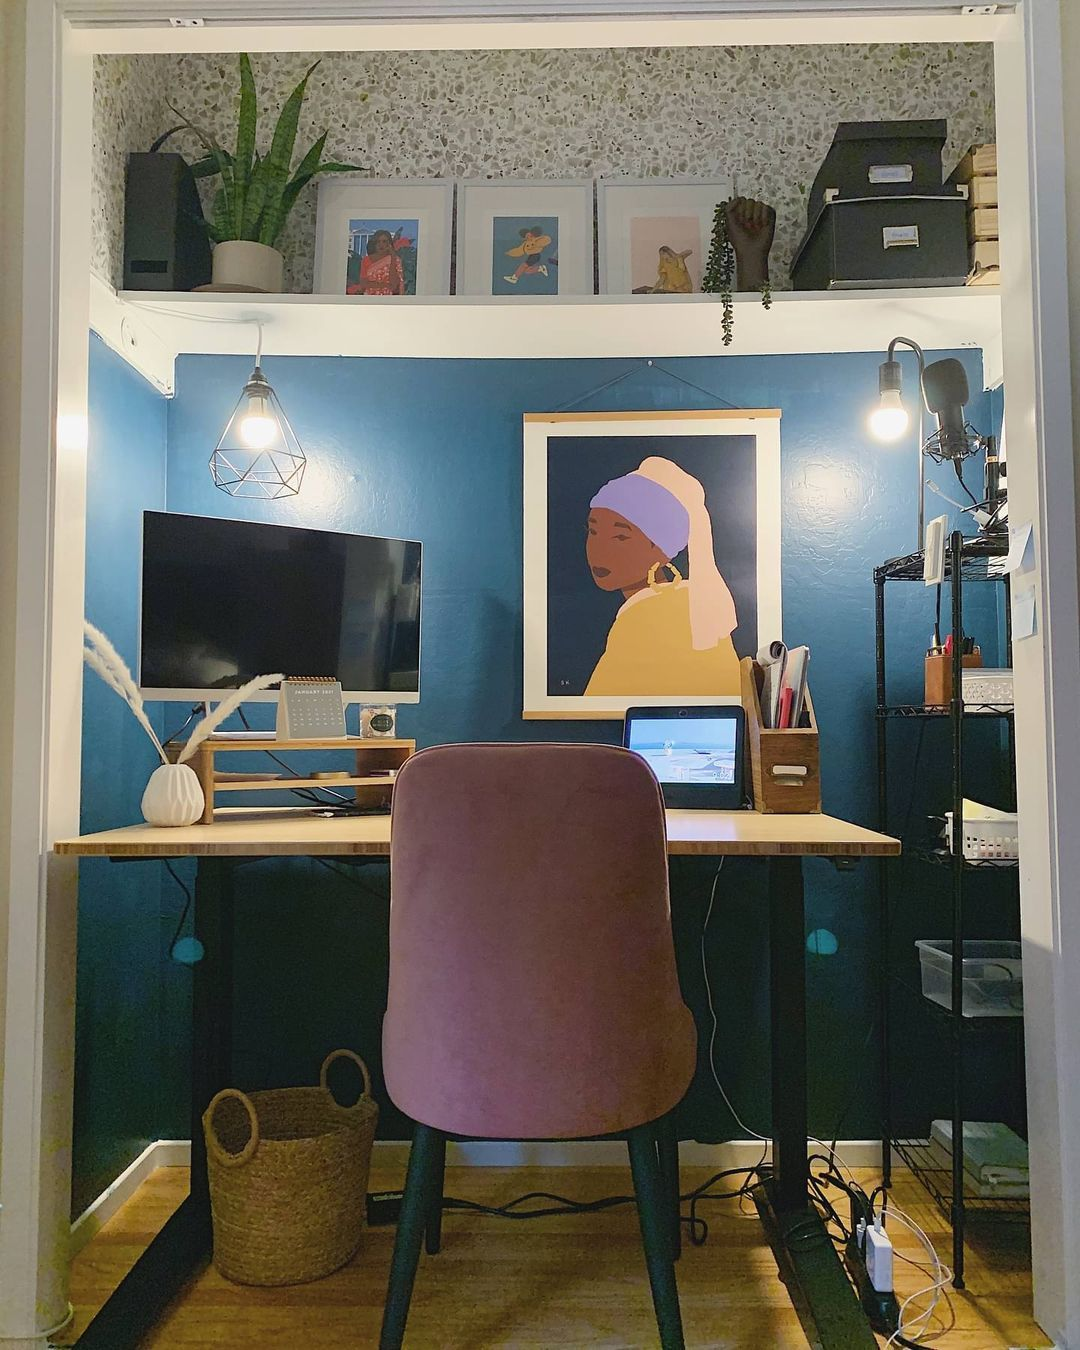 Artsy WFH closet ideas and cloffice inspiration